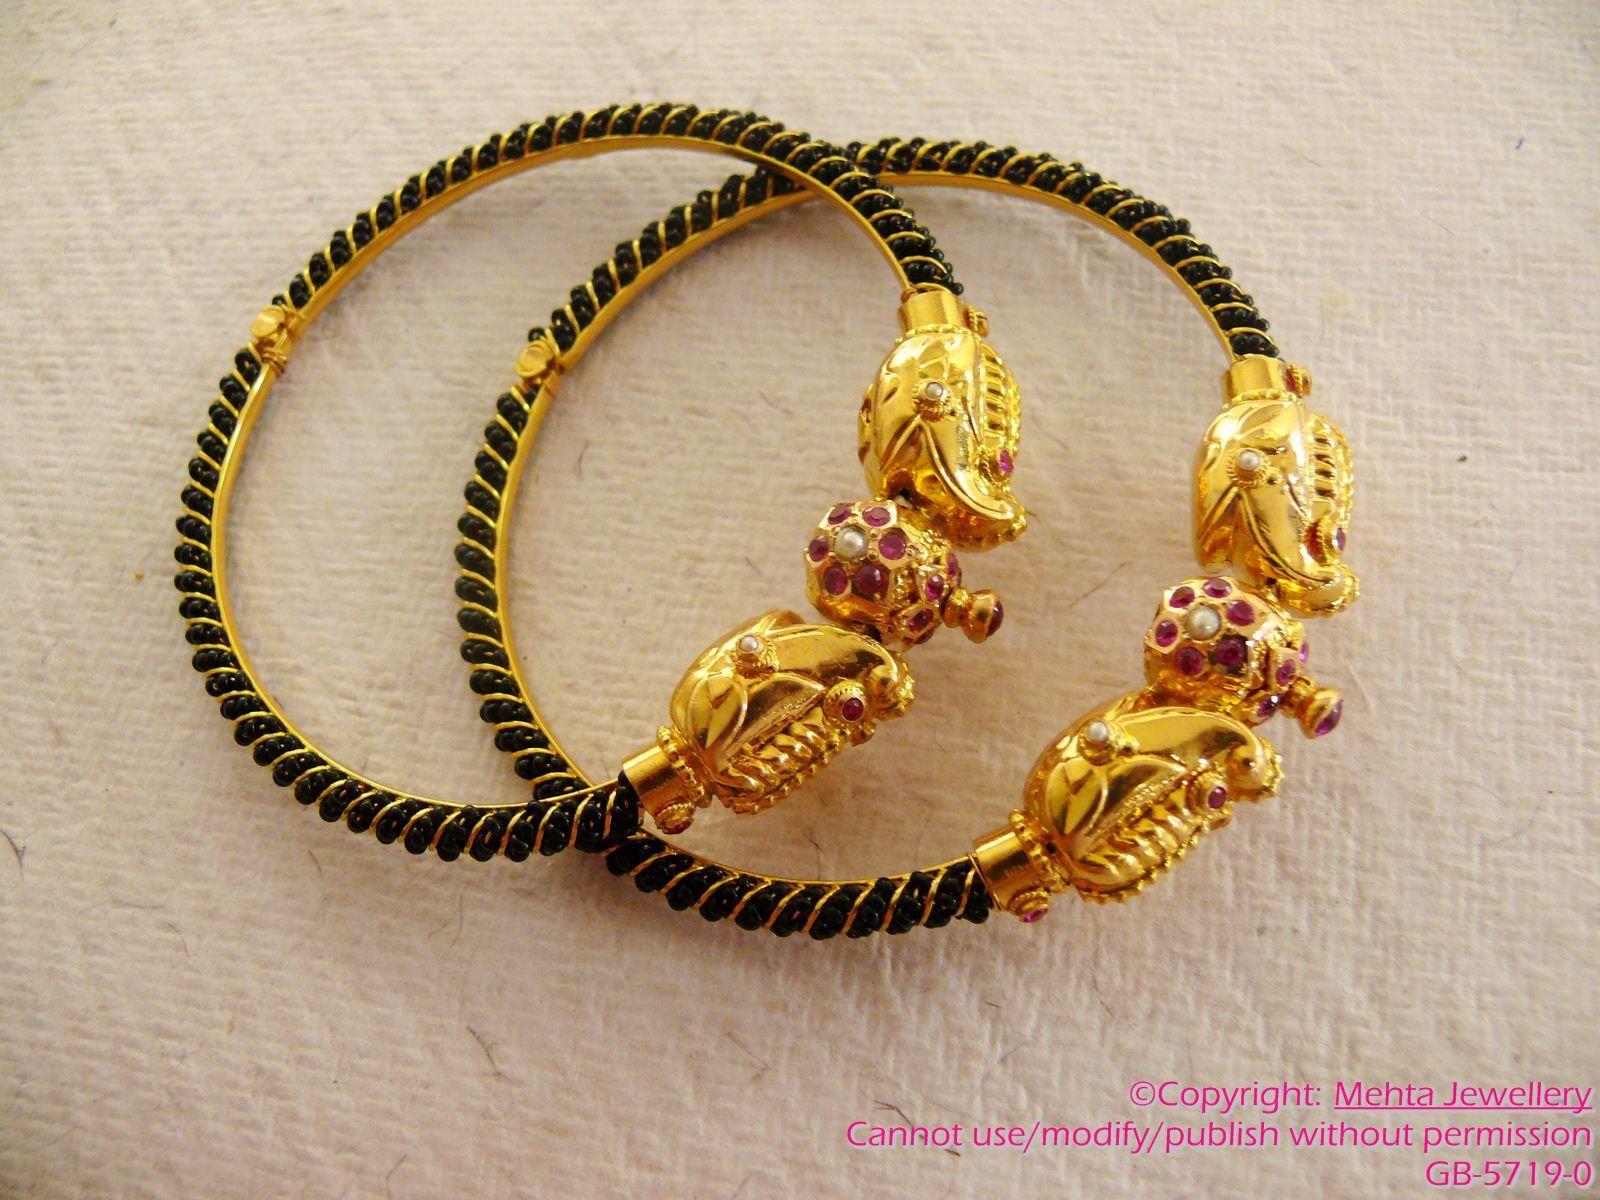 Bangles 1 Gold And Diamonds Jewelry Bangles Baby Jewelry